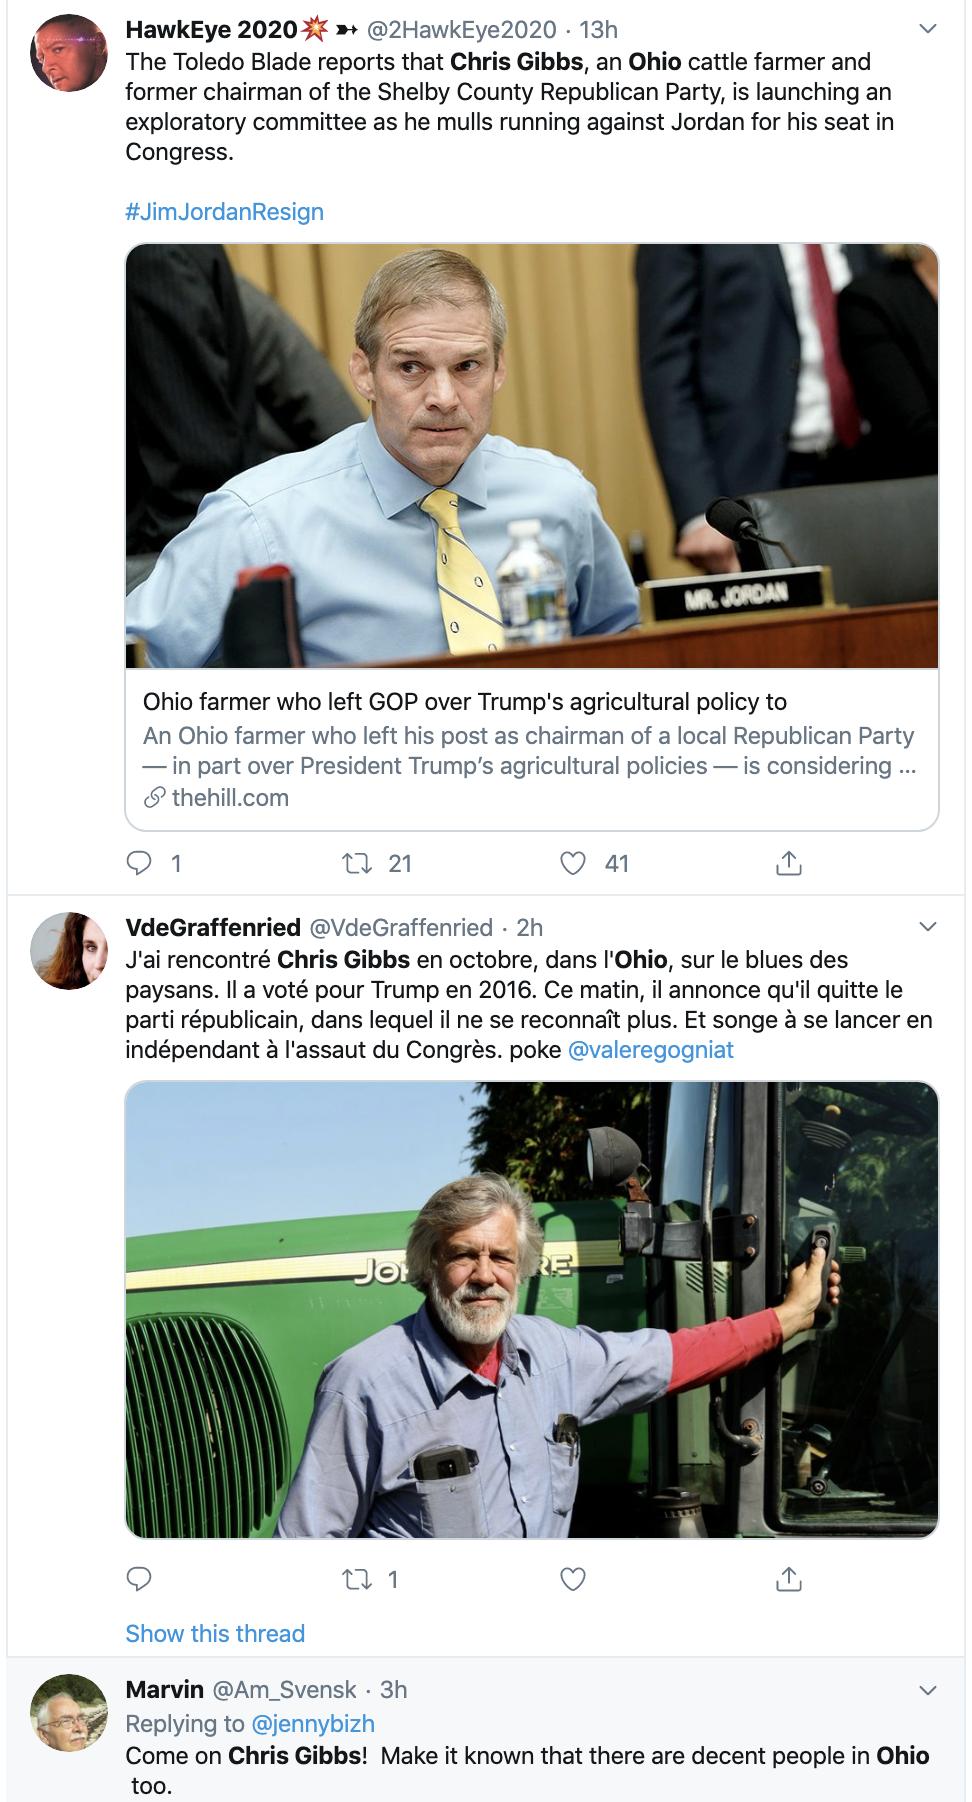 Screen-Shot-2019-11-20-at-9.21.28-AM Jim Jordan's 2020 Re-Election Takes Major Blow After Impeachment Debacle Election 2020 Featured Impeachment Politics Top Stories